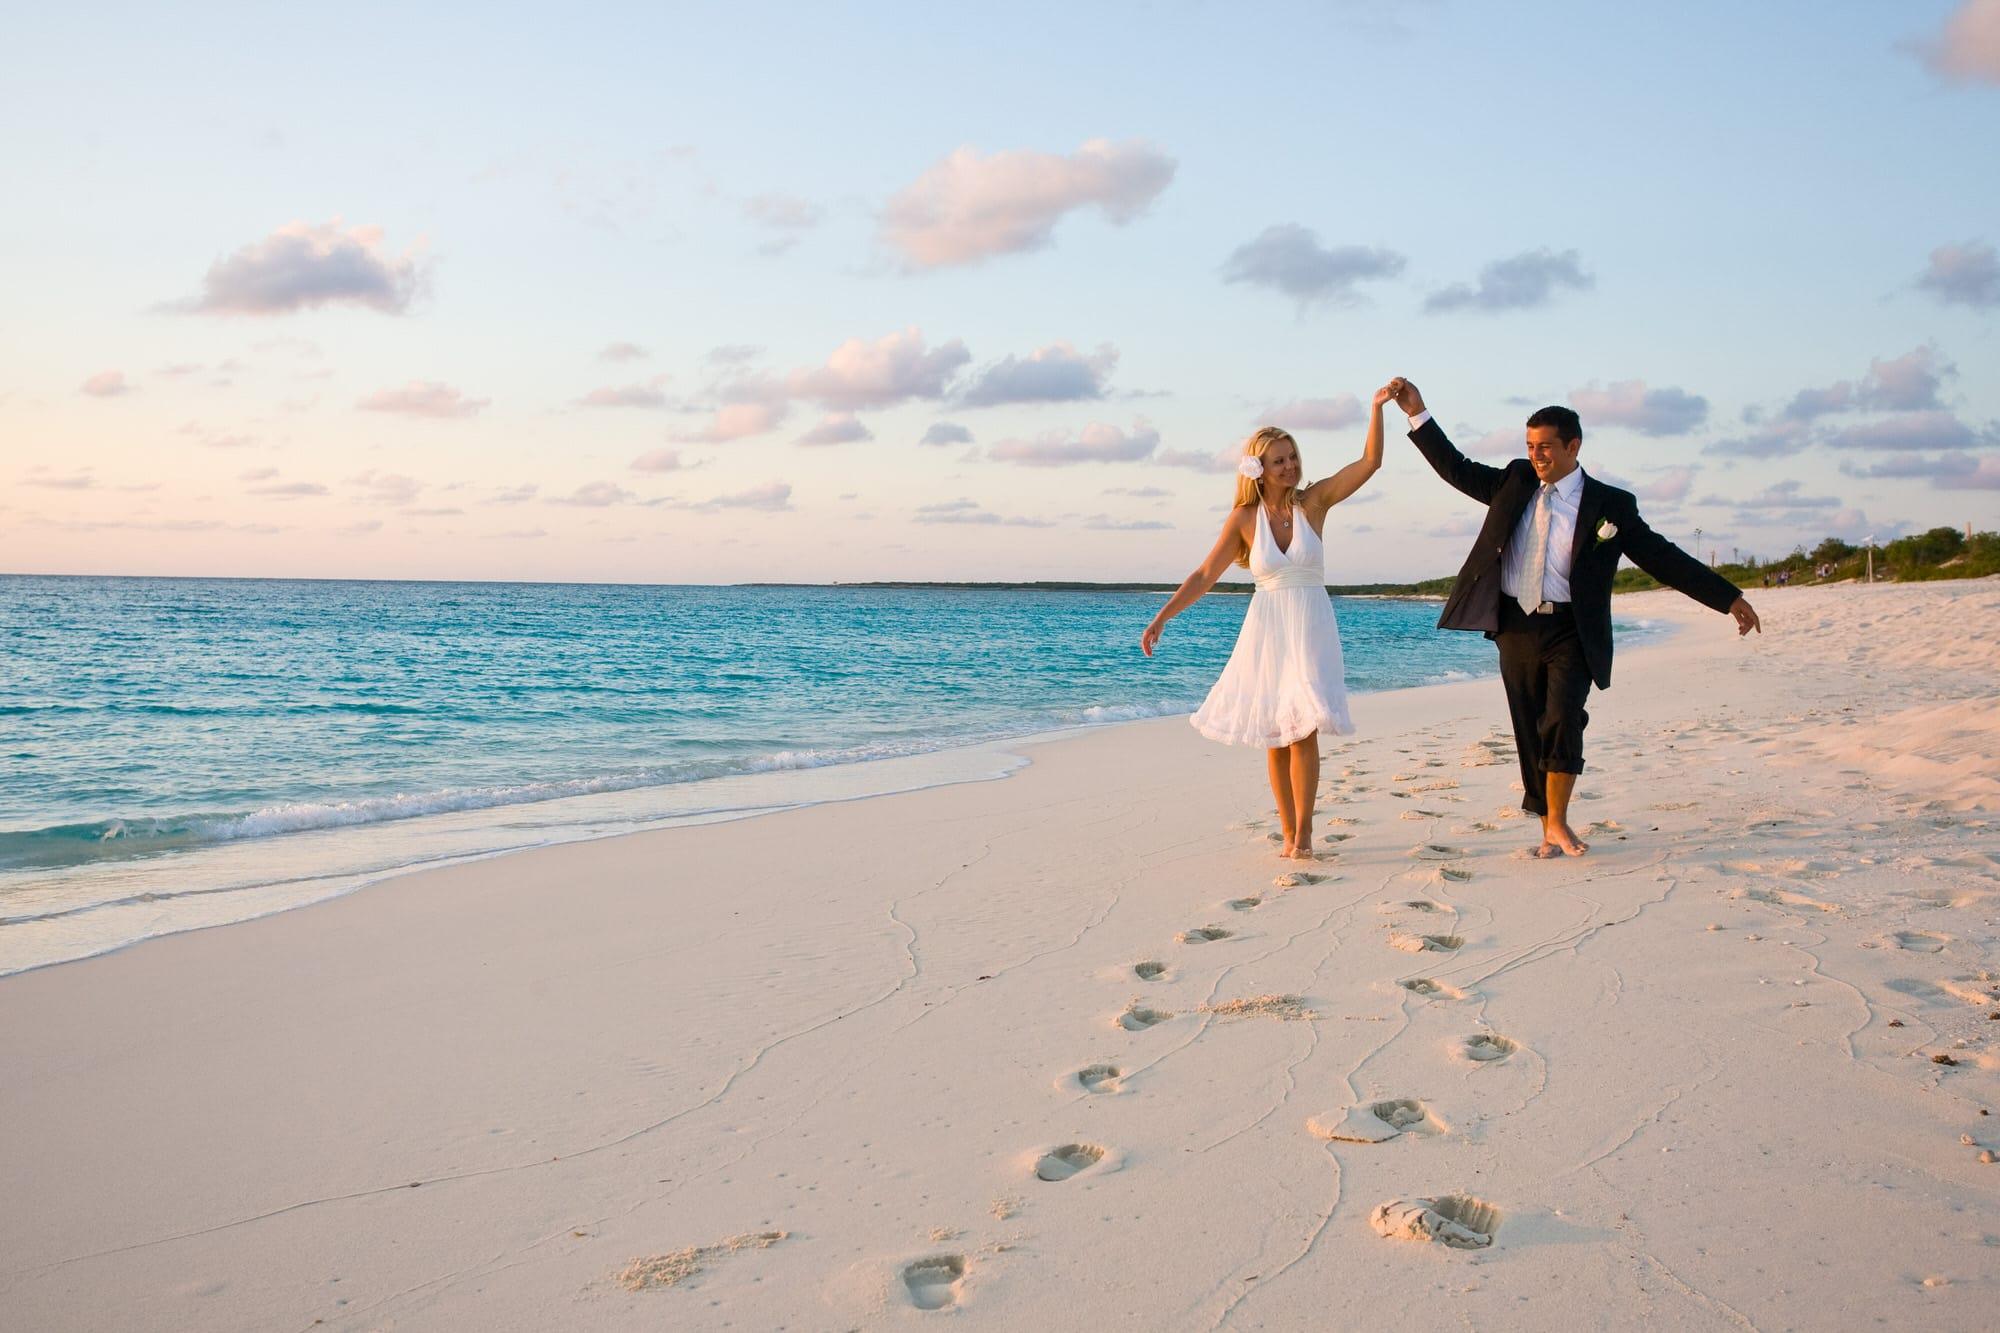 wedding-photographer-Chris-Mann-005